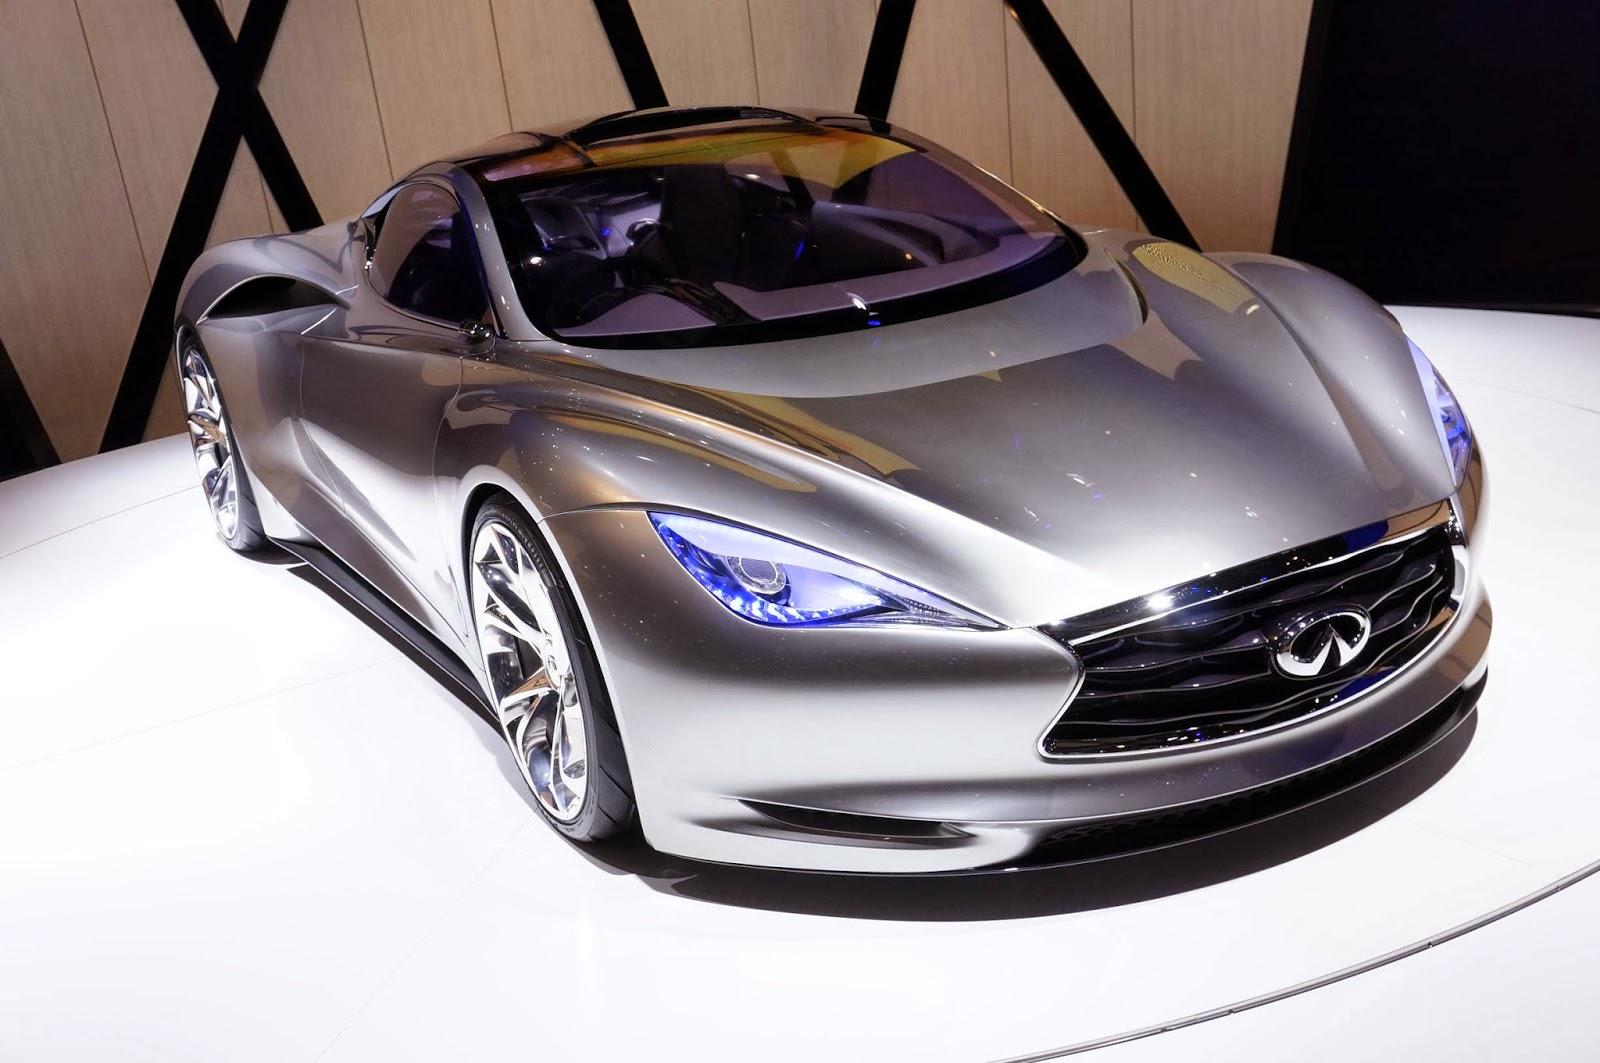 infiniti emerg e looks futuristic 100 electric car mycarzilla. Black Bedroom Furniture Sets. Home Design Ideas